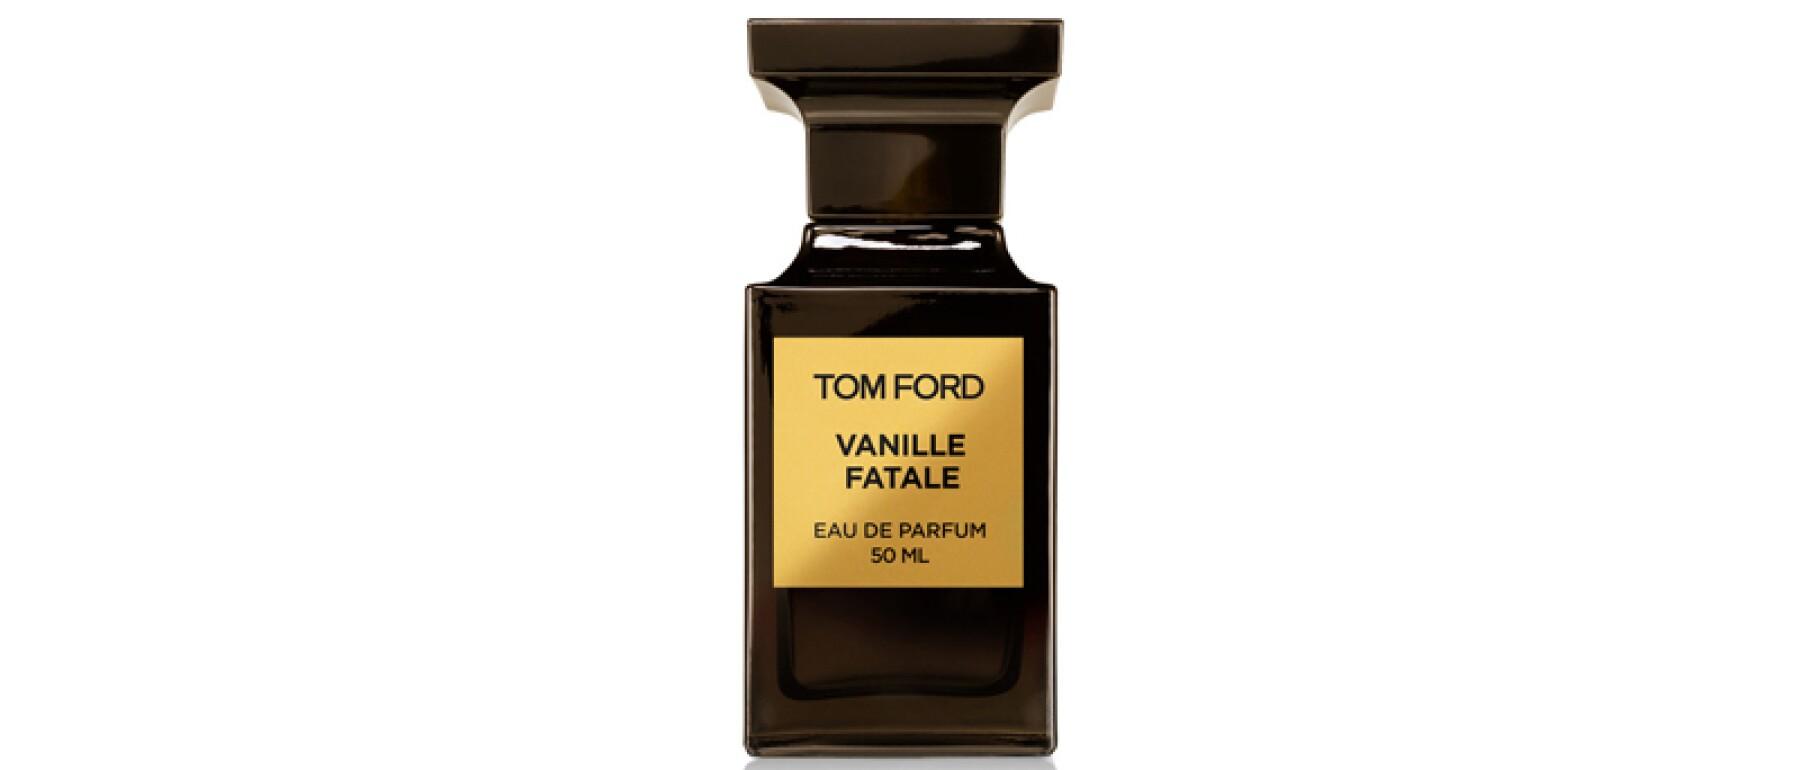 fragrances-autumn-tom ford.jpg